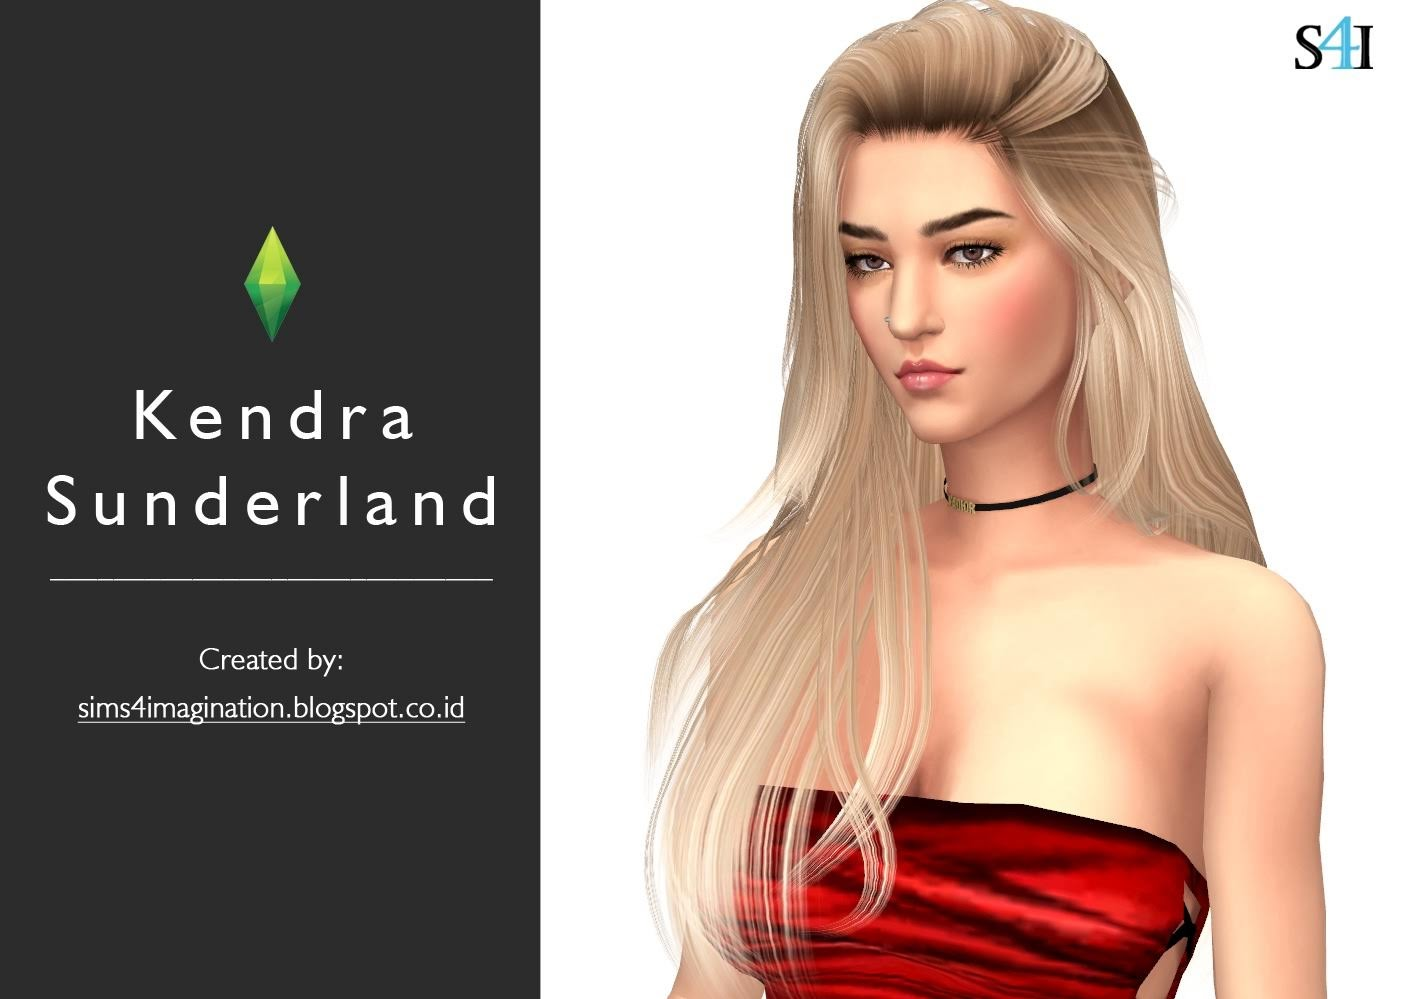 Actors Porn Born 1995 my sims 4 cas: kendra sunderland - imagination sims 4 cas